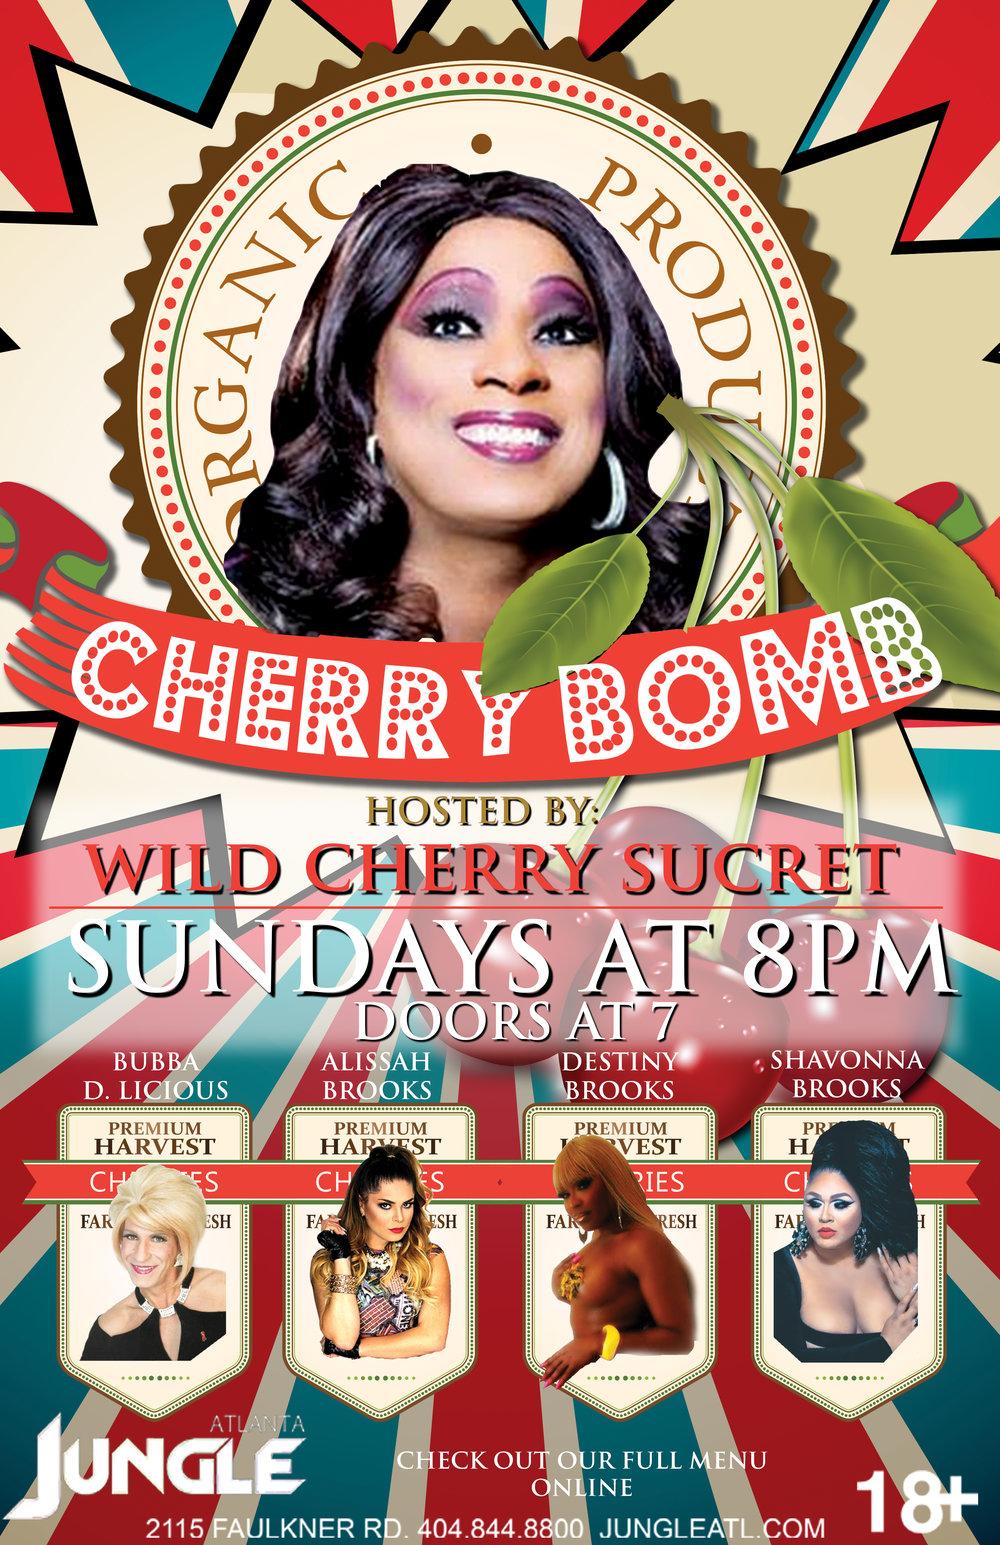 cherrybombRGB.jpg